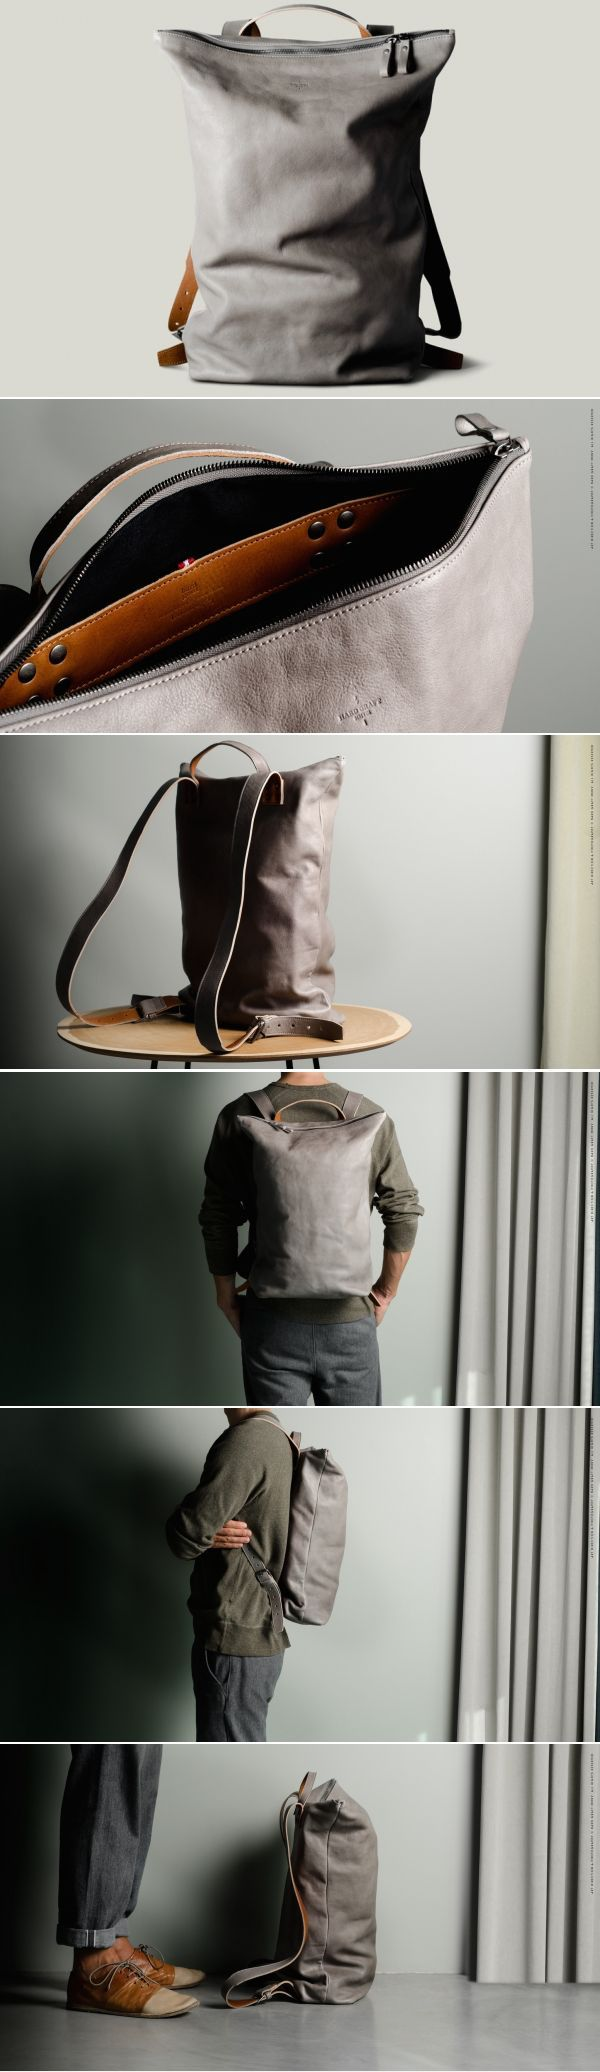 #hardgraft Outsider Backpack / Field - cute over the shoulder bags, cheap bags online, women's shoulder bags sale *sponsored https://www.pinterest.com/bags_bag/ https://www.pinterest.com/explore/bag/ https://www.pinterest.com/bags_bag/leather-bags-for-men/ http://www.barneys.com/category/women/bags/N-pwix8e